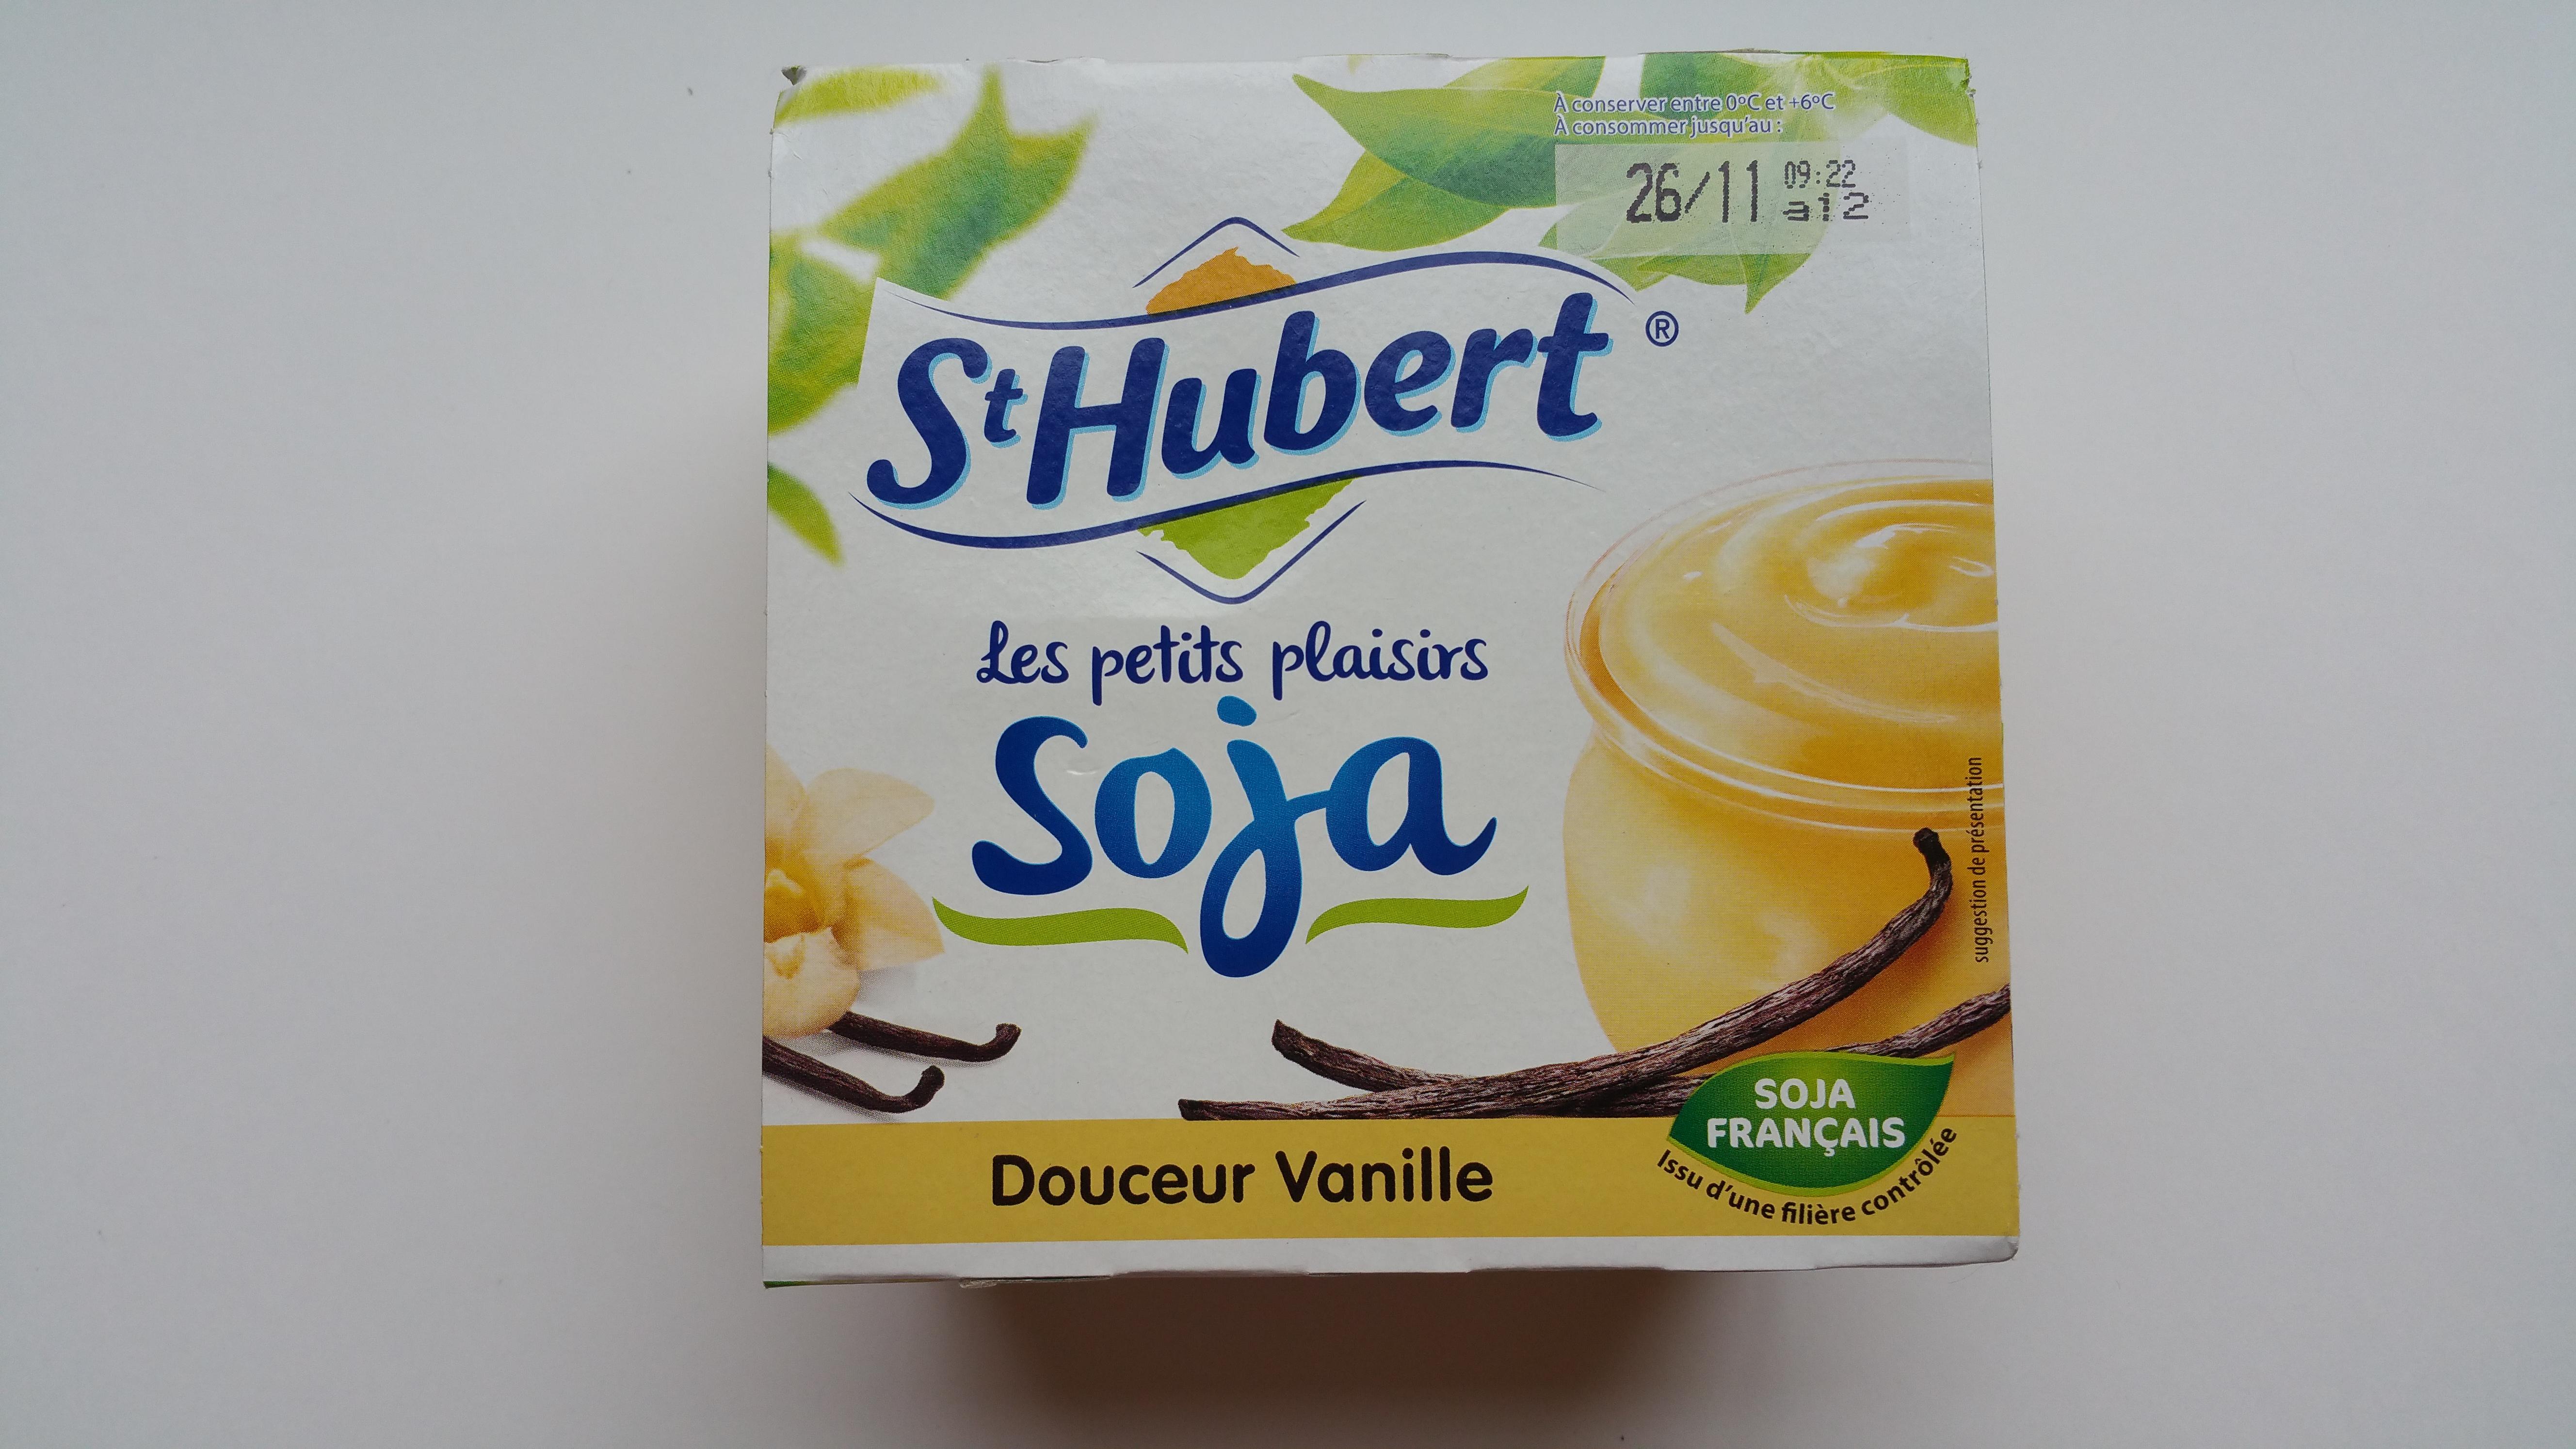 St-Hubert-Petits-Plaisirs-Soja®-Douceur-Vanille - Les-Petits-Plaisirs-Soja®-Douceur-Vanille-6.jpg